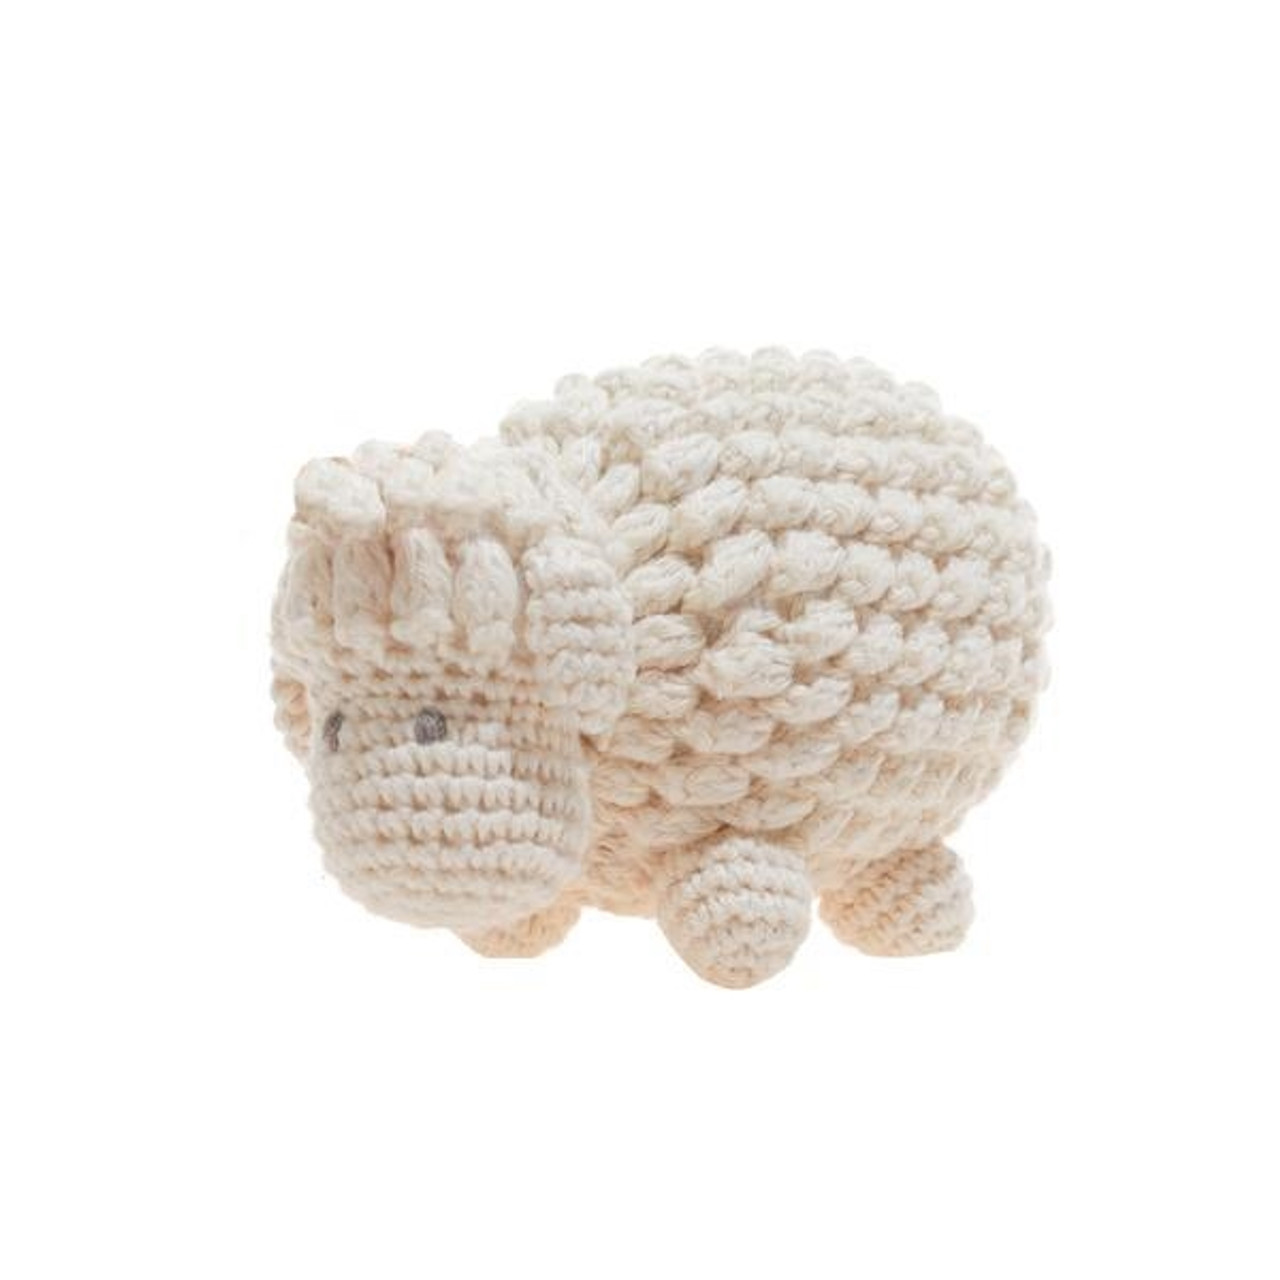 Organic Baby Sheep Rattle Toy